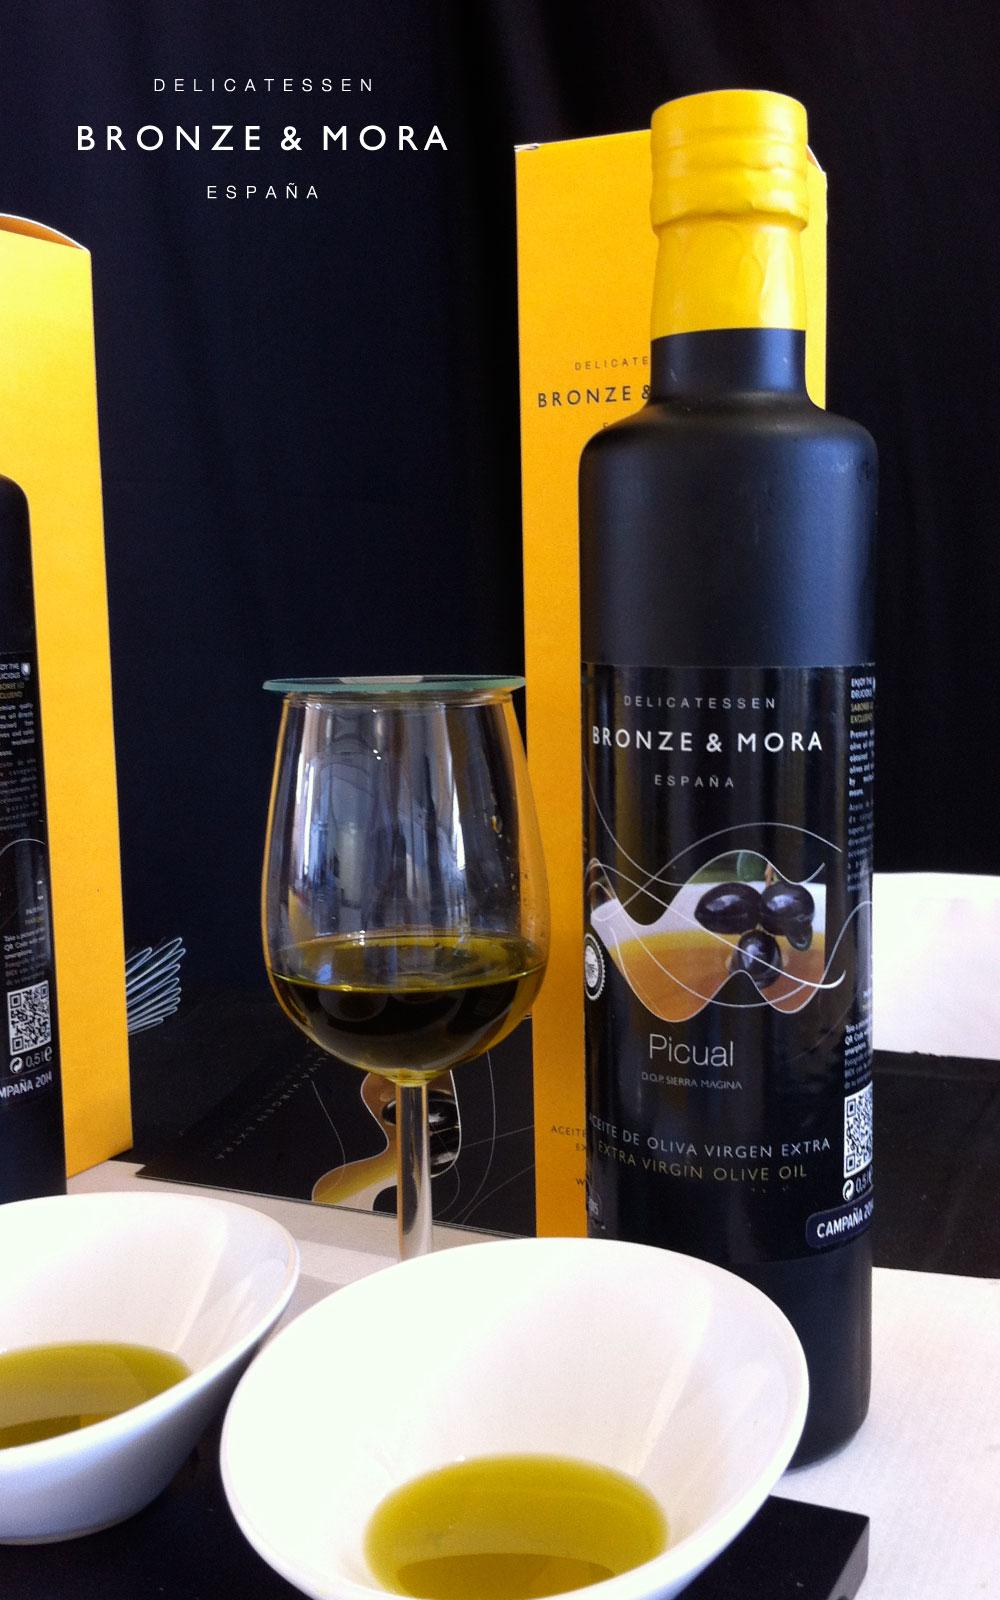 Feria-AOVE-costa-del-Sol-Bronze-&-Mora-el-mejor-aceite-de-oliva-virgen-extra-4